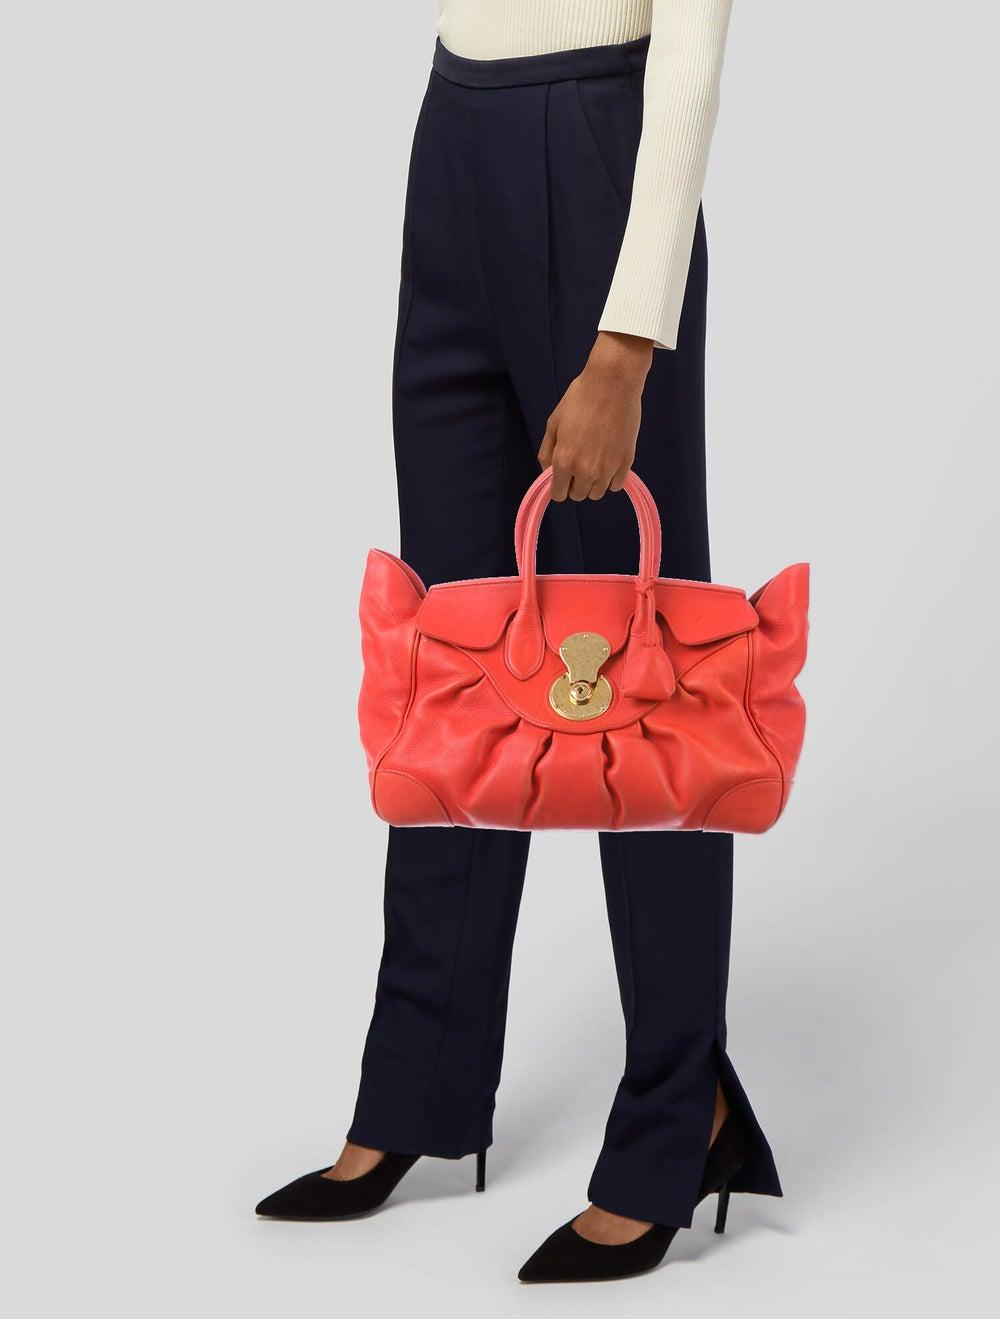 Ralph Lauren Puffy Ricky Bag gold - image 2